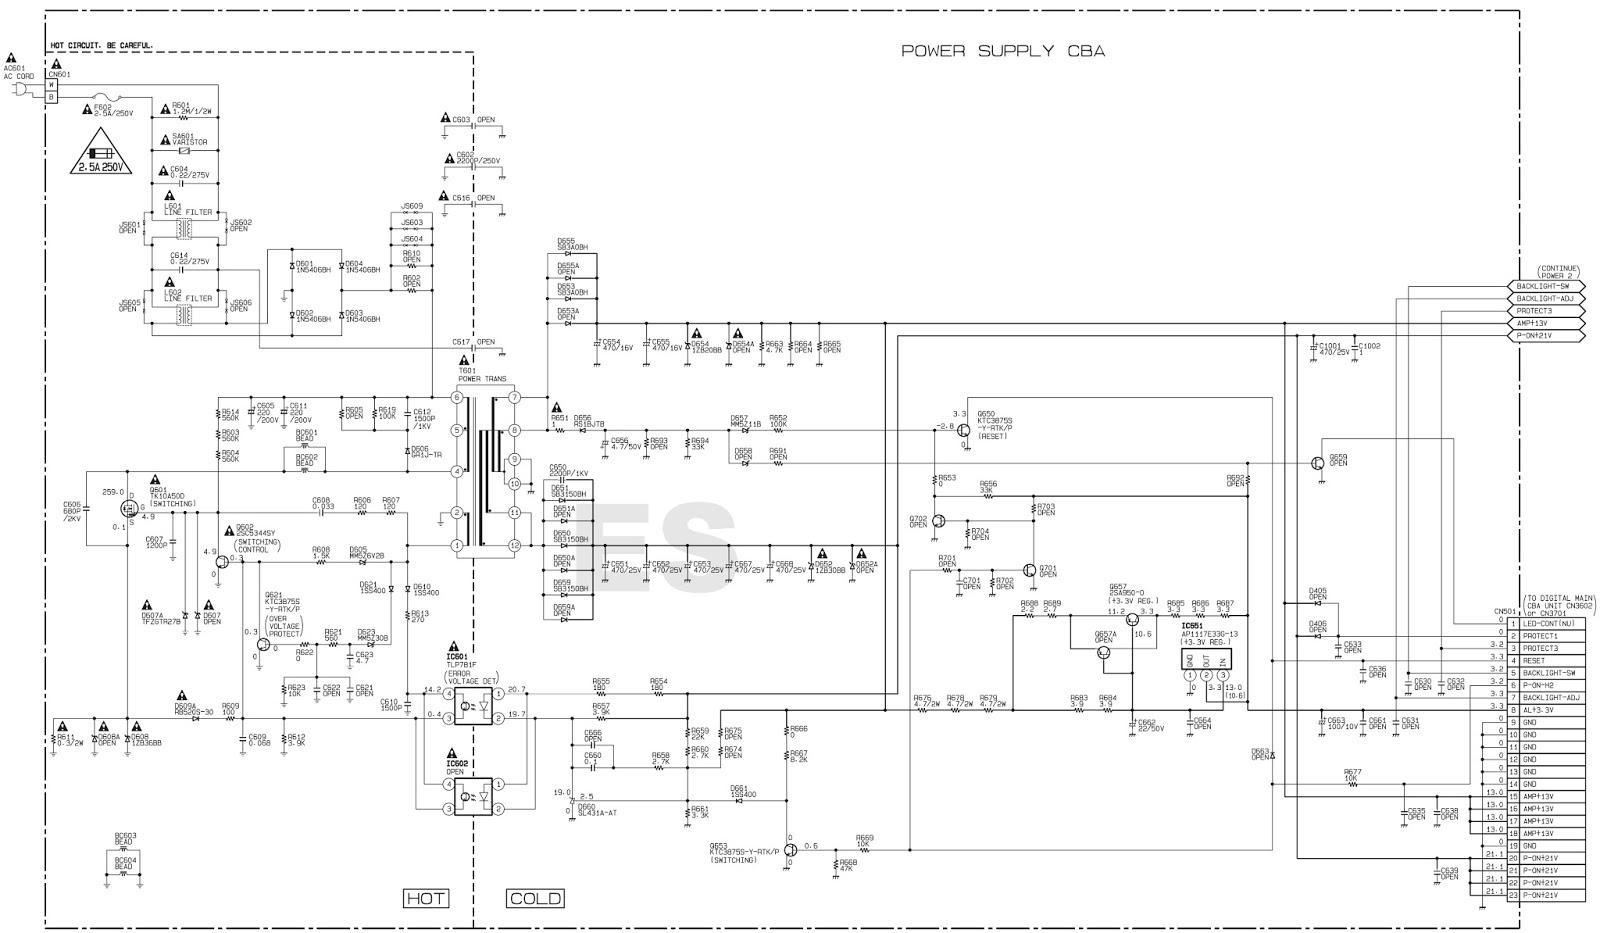 Funai Tv Schematic Diagram - Wiring Diagram Meta on vcr schematic diagram, phase linear car stereo wiring diagram, alpine car stereo wiring diagram, sony car stereo wiring diagram, magnavox zv427mg9 a parts, magnavox am fm receiver schematic 1500, delphi delco car stereo wiring diagram, fujitsu ten limited radio wiring diagram, mitsubishi projection tv diagram, samsung tv wiring diagram, pioneer kp 500 schematic diagram, magnavox vcr remote codes, samsung schematic diagram, magnavox radio phonograph model 262, magnavox 32mf231d 37 schematic, panasonic car stereo wiring diagram, sony schematic diagram, panasonic schematic diagram, sanyo radio wiring diagram,